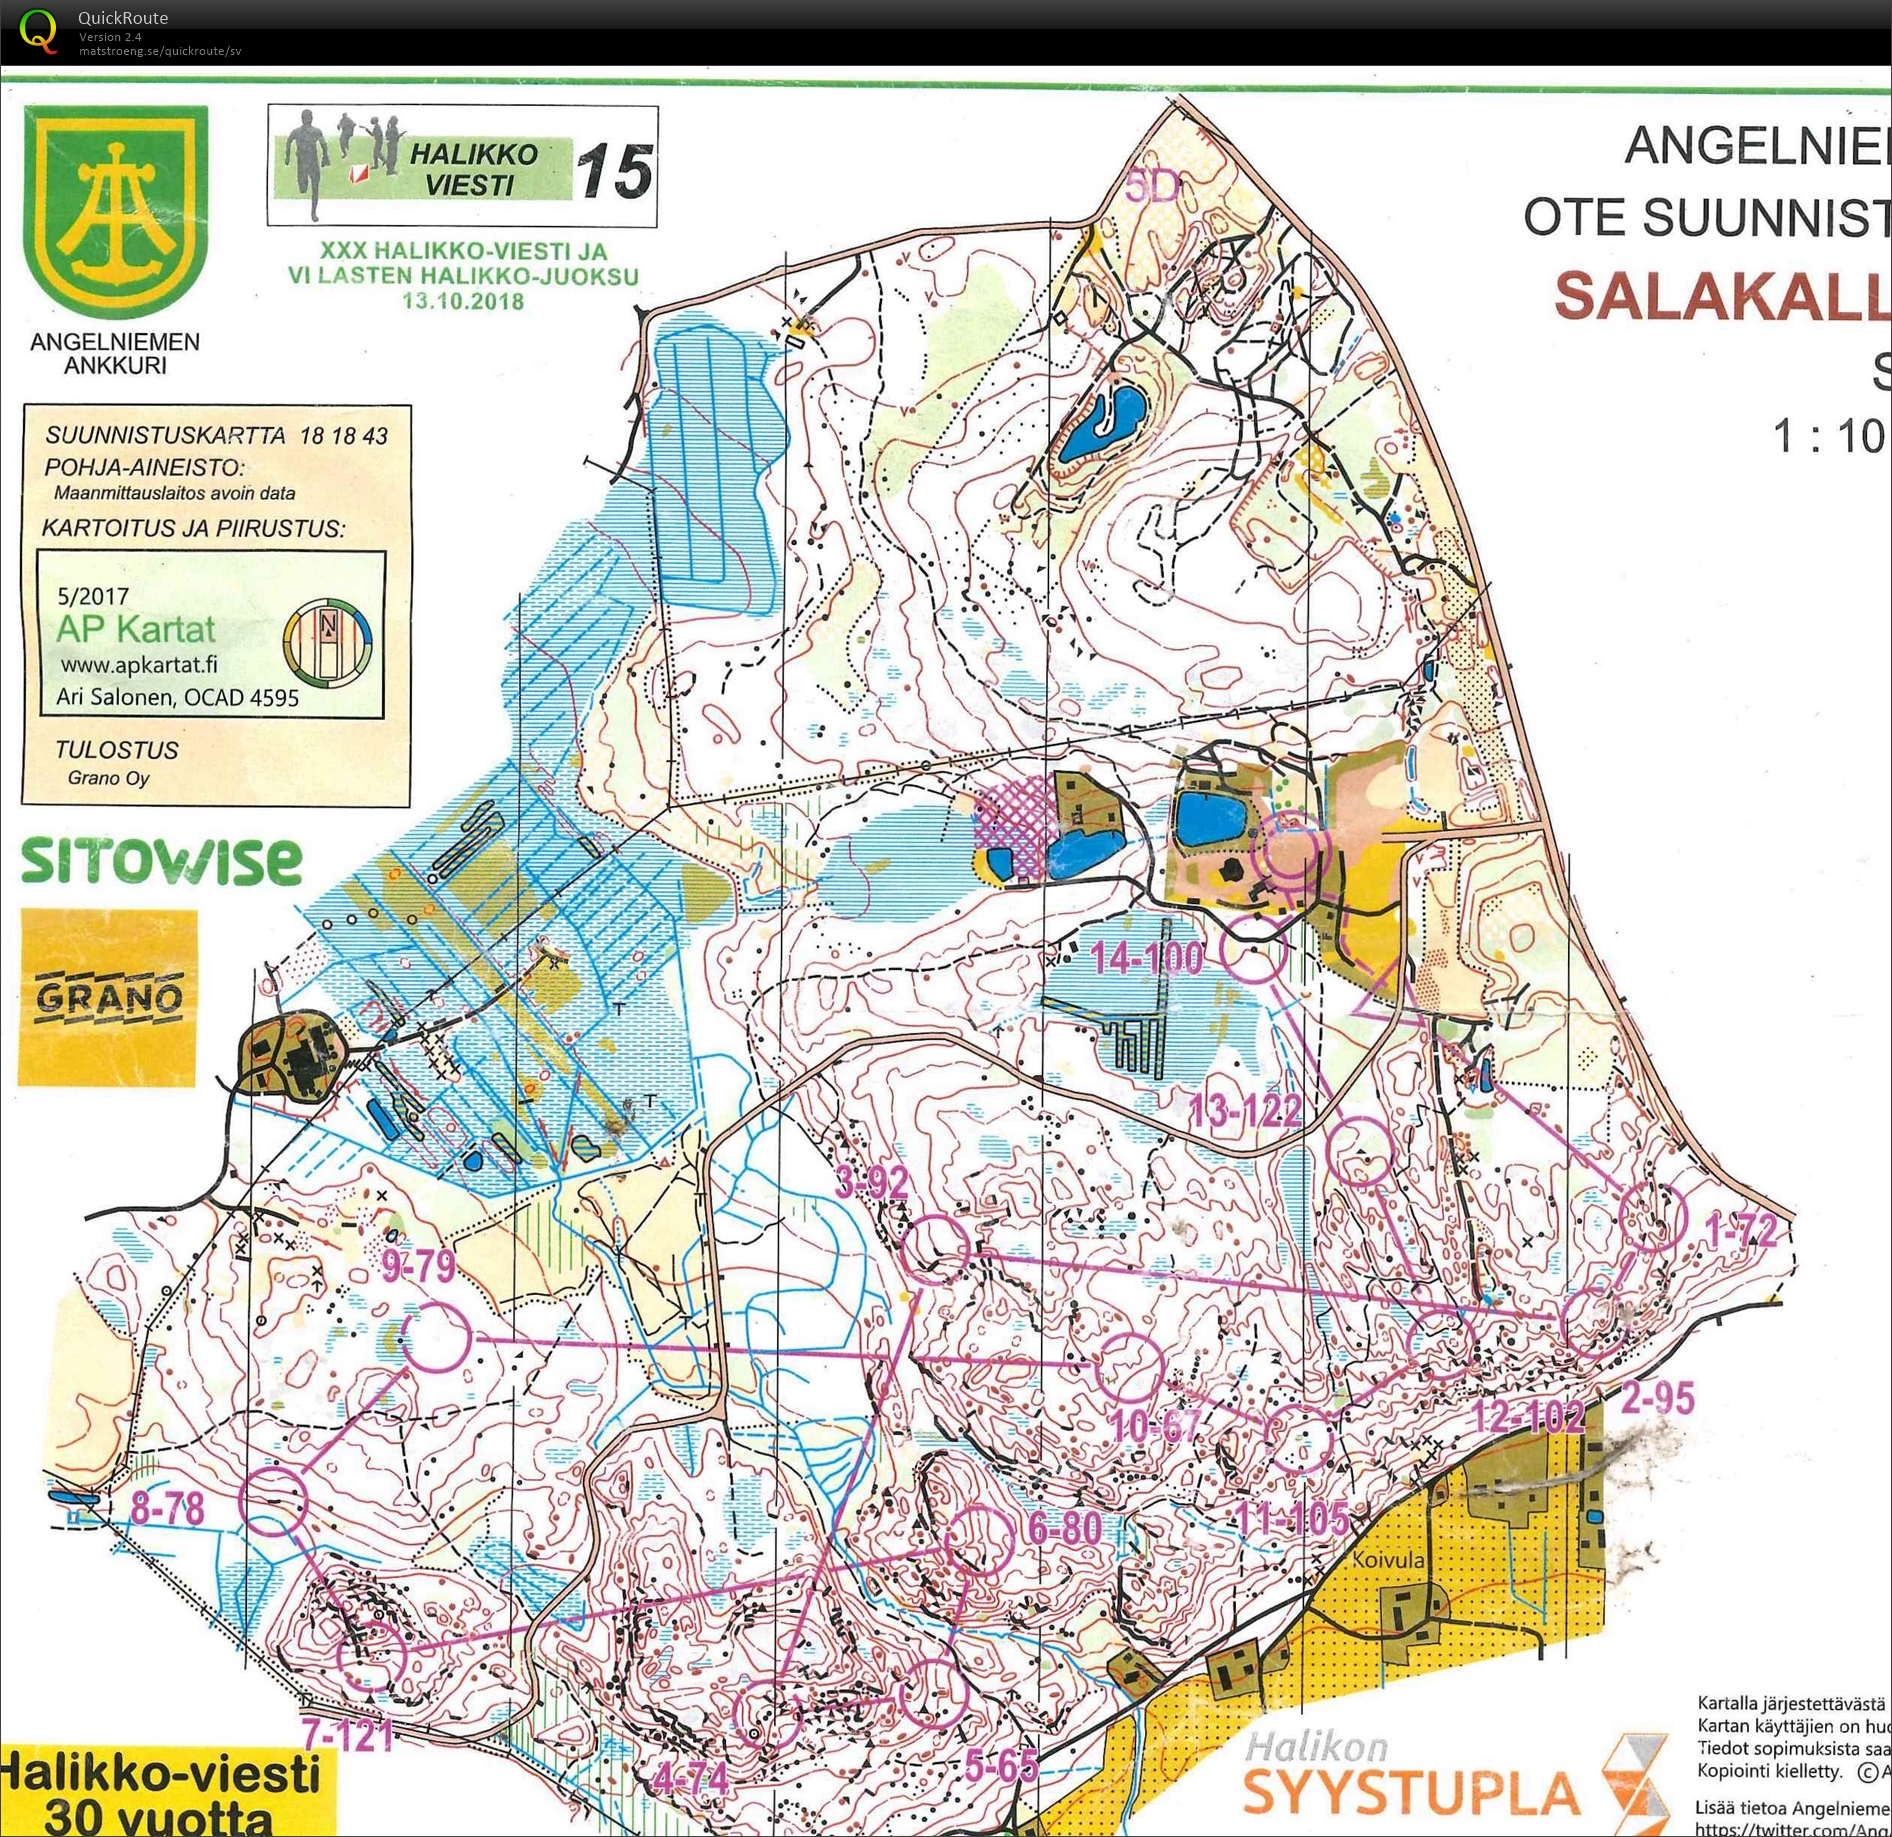 Halikko October 13th 2018 Orienteering Map From Lars Palmqvist